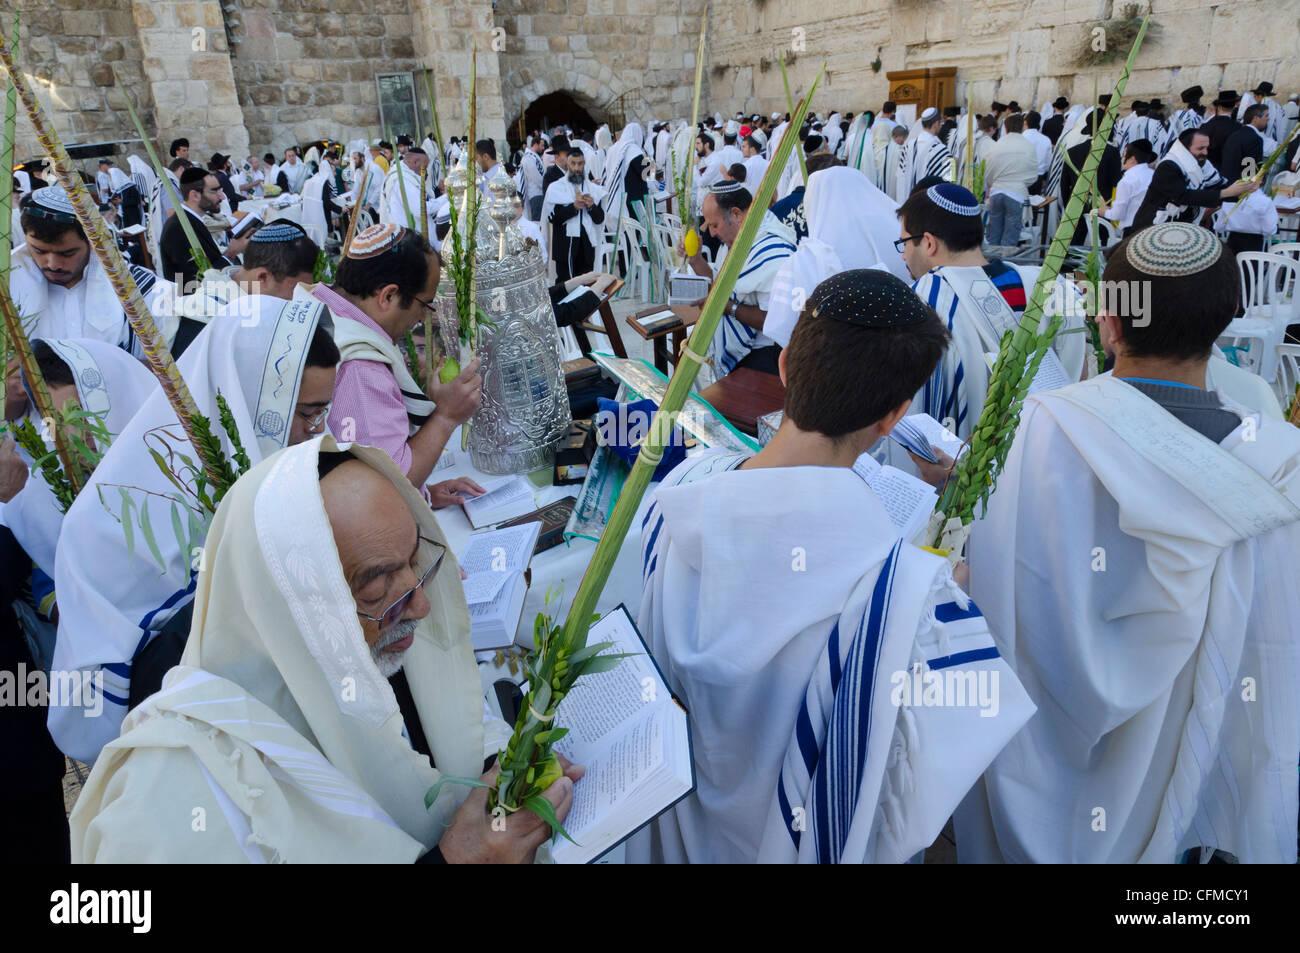 Sukkot celebrations with Lulav, Western Wall, Old City, Jerusalem, Israel, Middle East - Stock Image